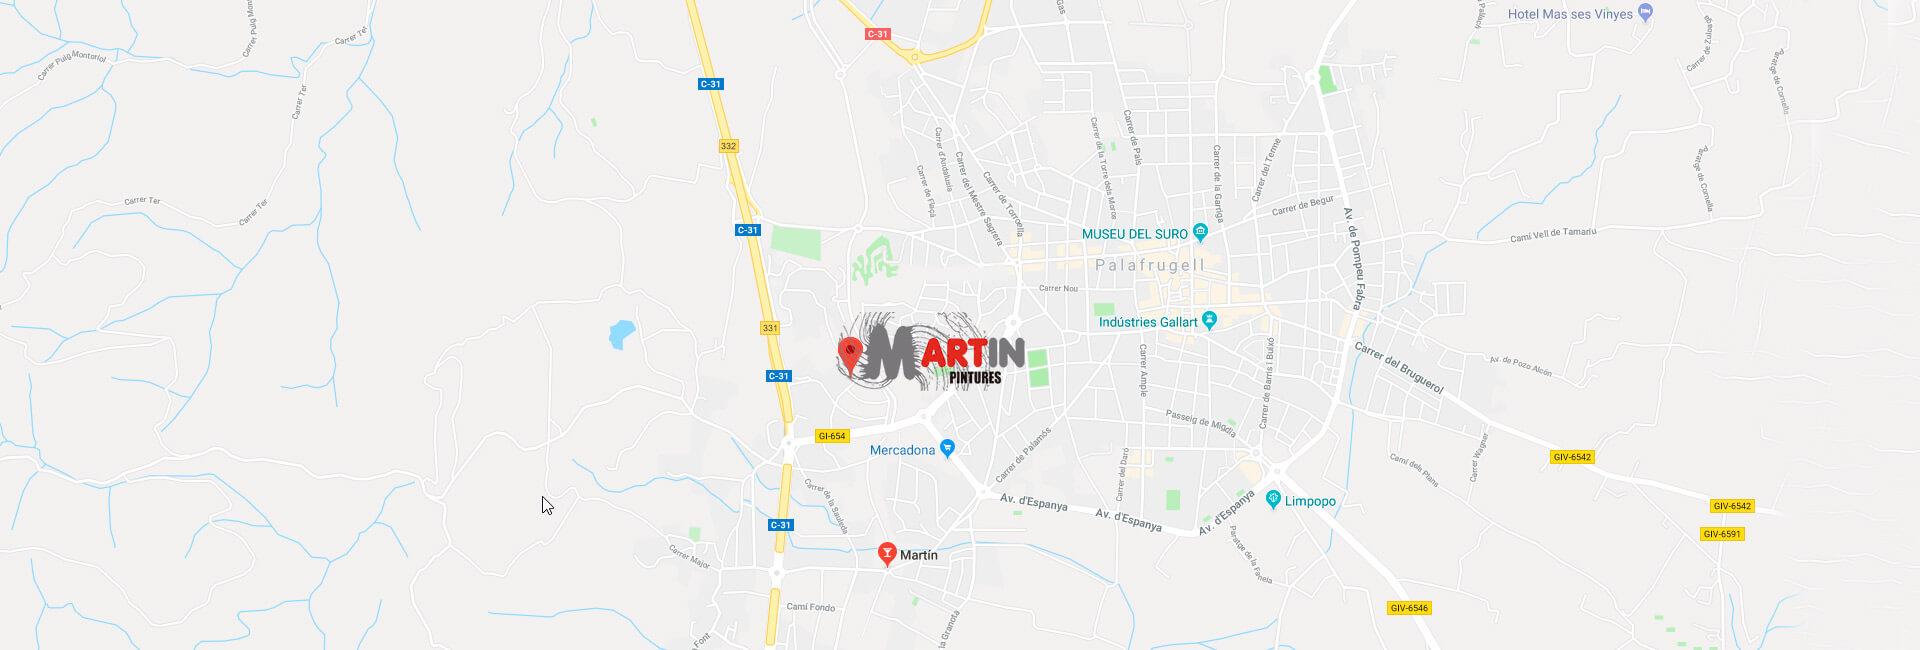 martin-pintures-mapa